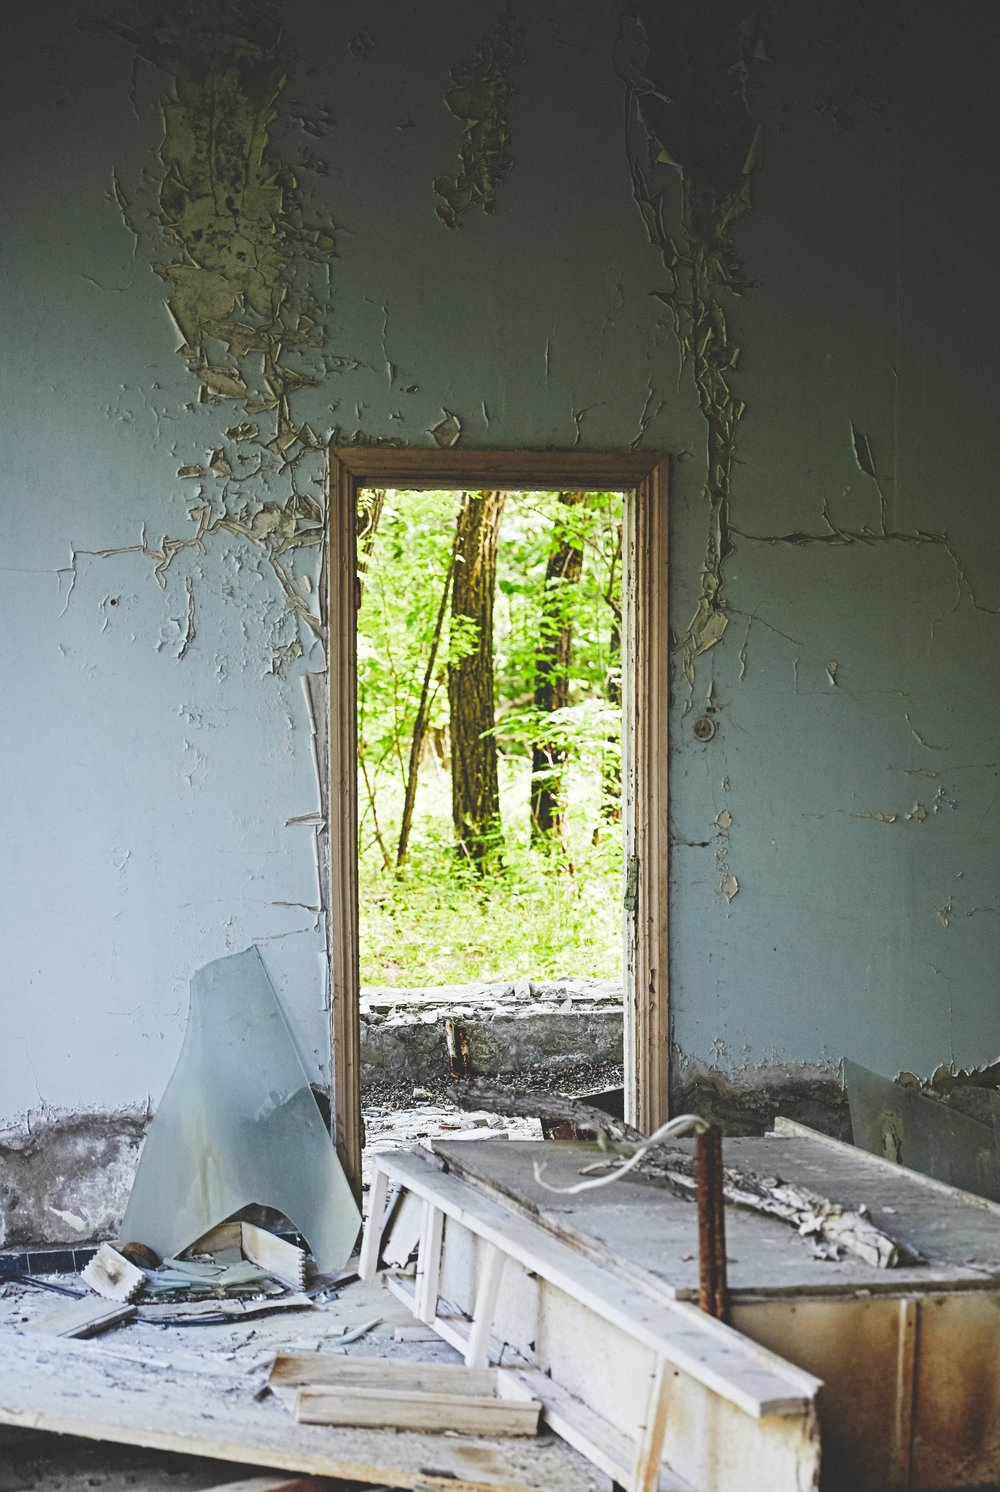 0H9A0199Chernboyl Pripyat Foto Emily Dahl.jpg